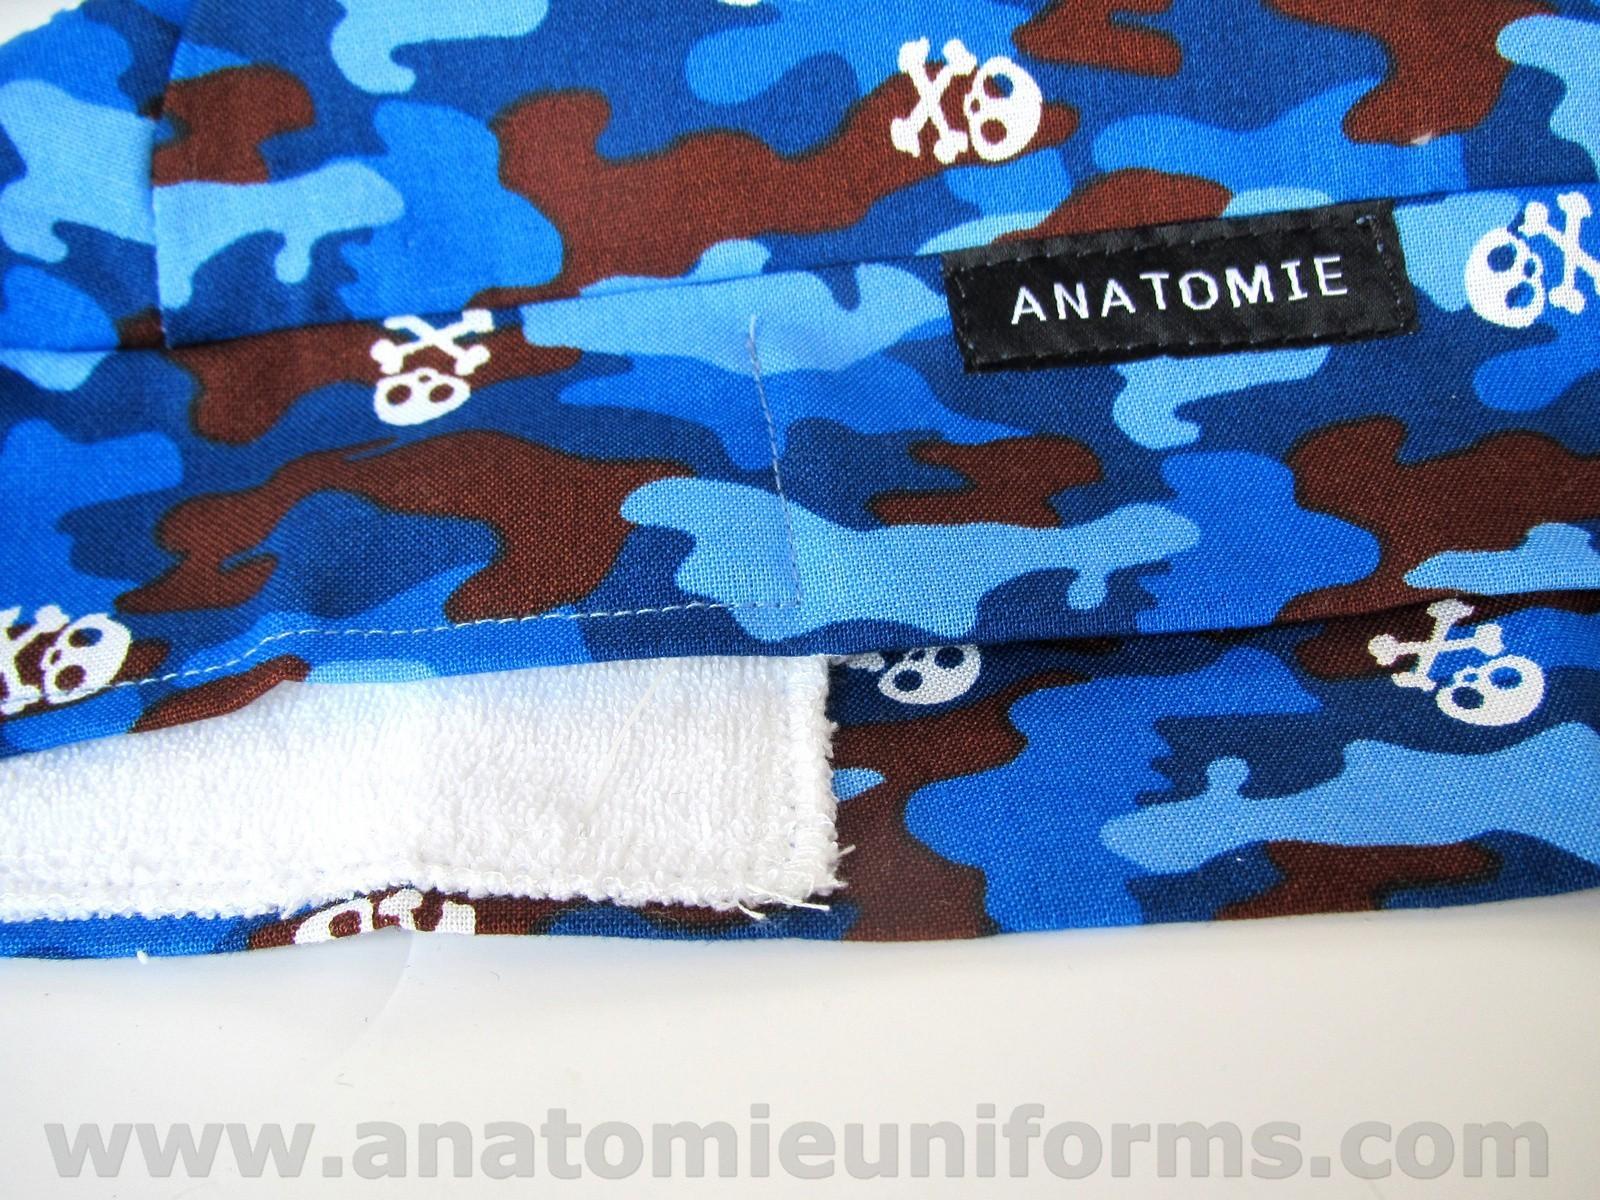 ANATOMIE BANDANA Quirofano Camuflaje Azul - 019c